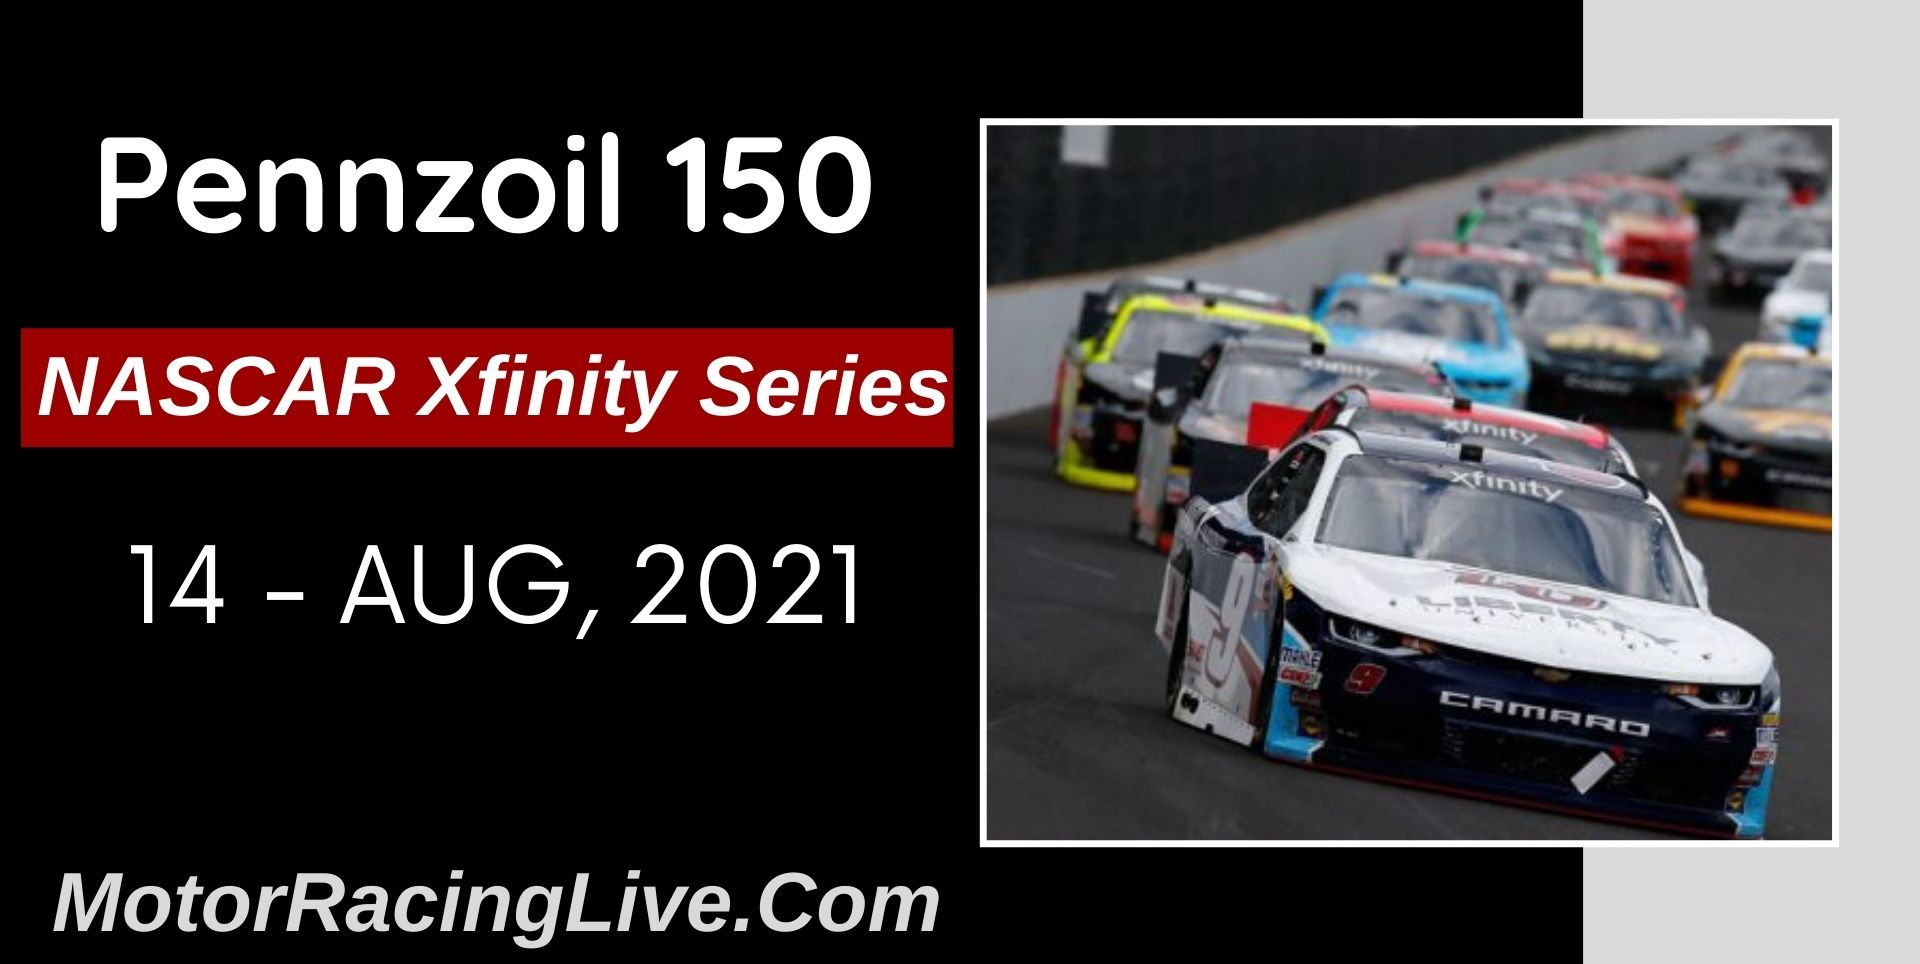 Pennzoil 150 Live Stream 2021: NASCAR Xfinity Series